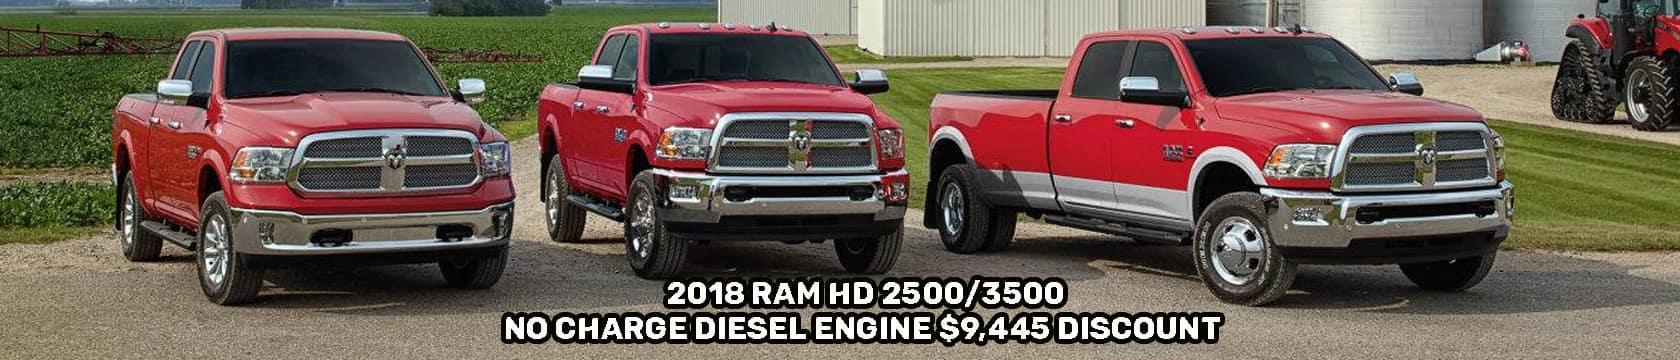 2018 Ram 2500 & 3500 Banner 1